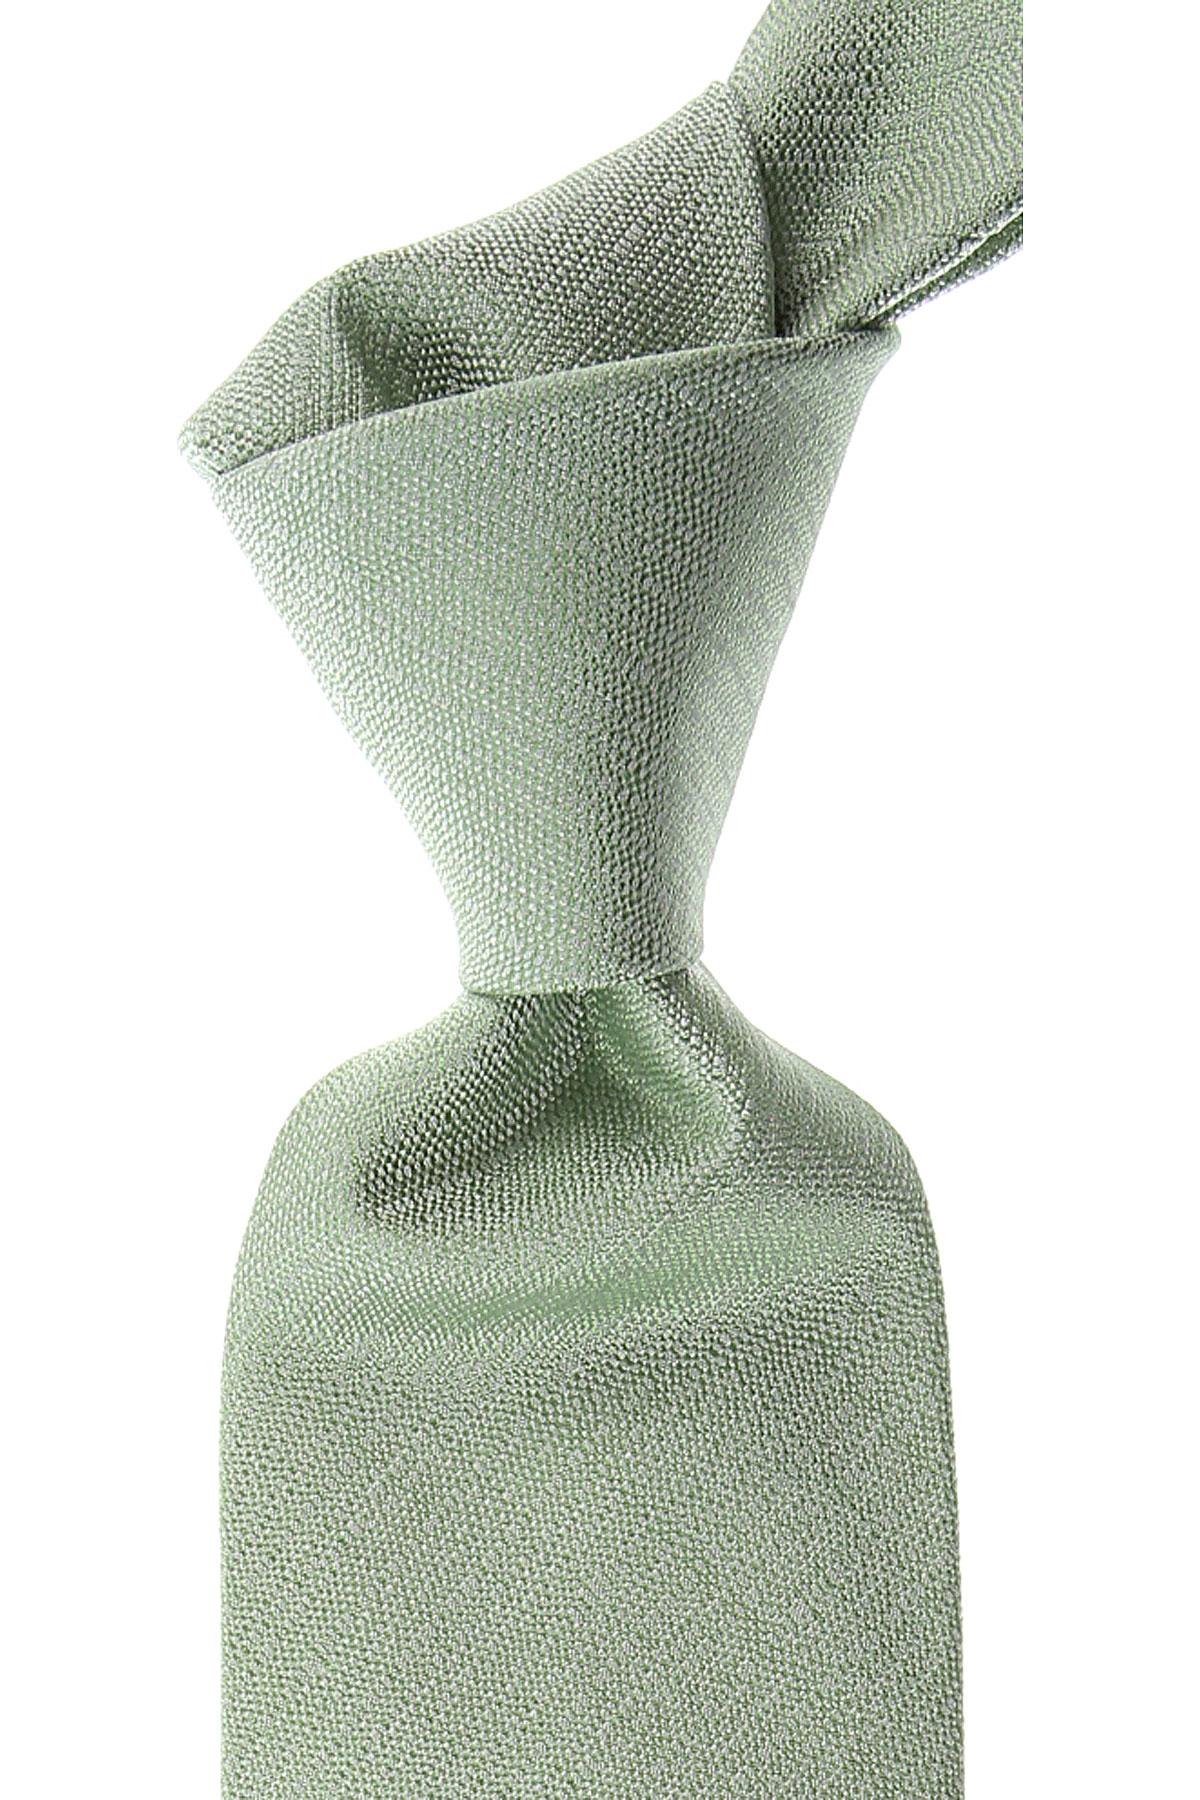 Moschino Cravates Pas cher en Soldes, Light Grass Green Melange, Soie, 2019